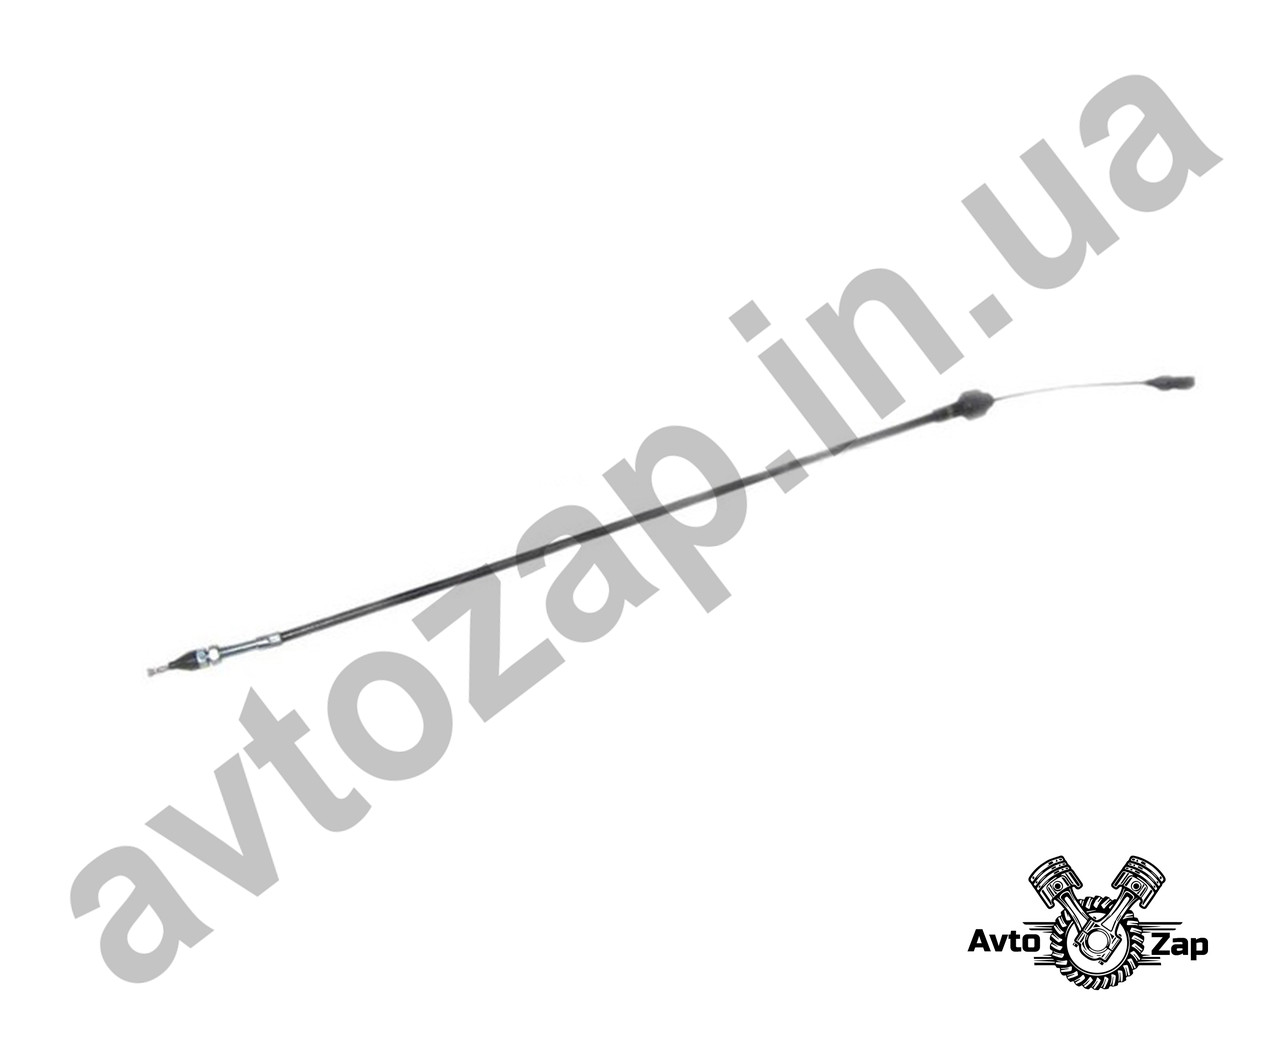 Трос газа Москвич 2141 карбюратор Озон L-825мм